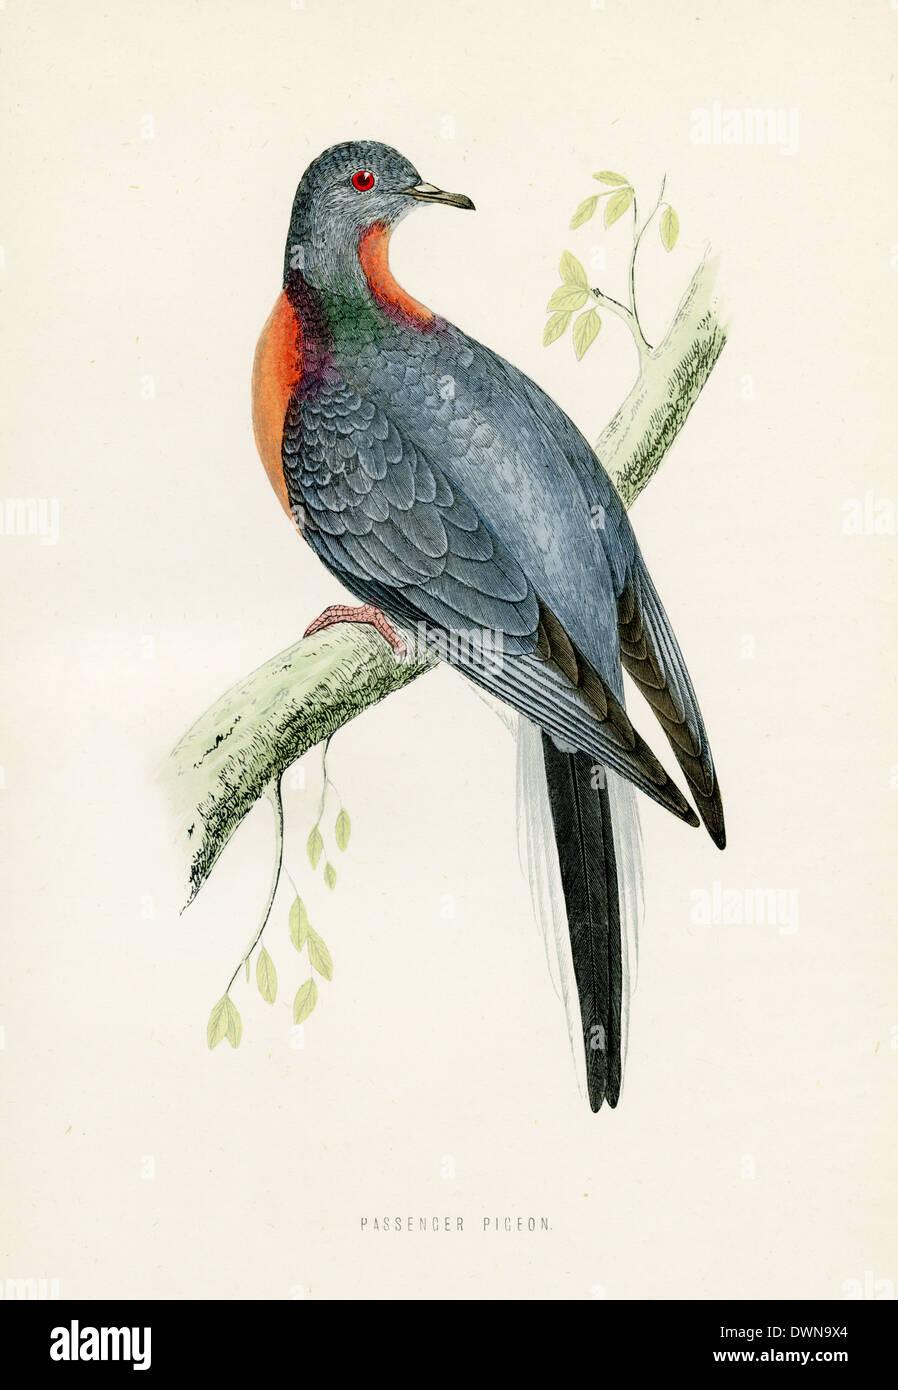 Passenger pigeon, Wild pigeon - Stock Image